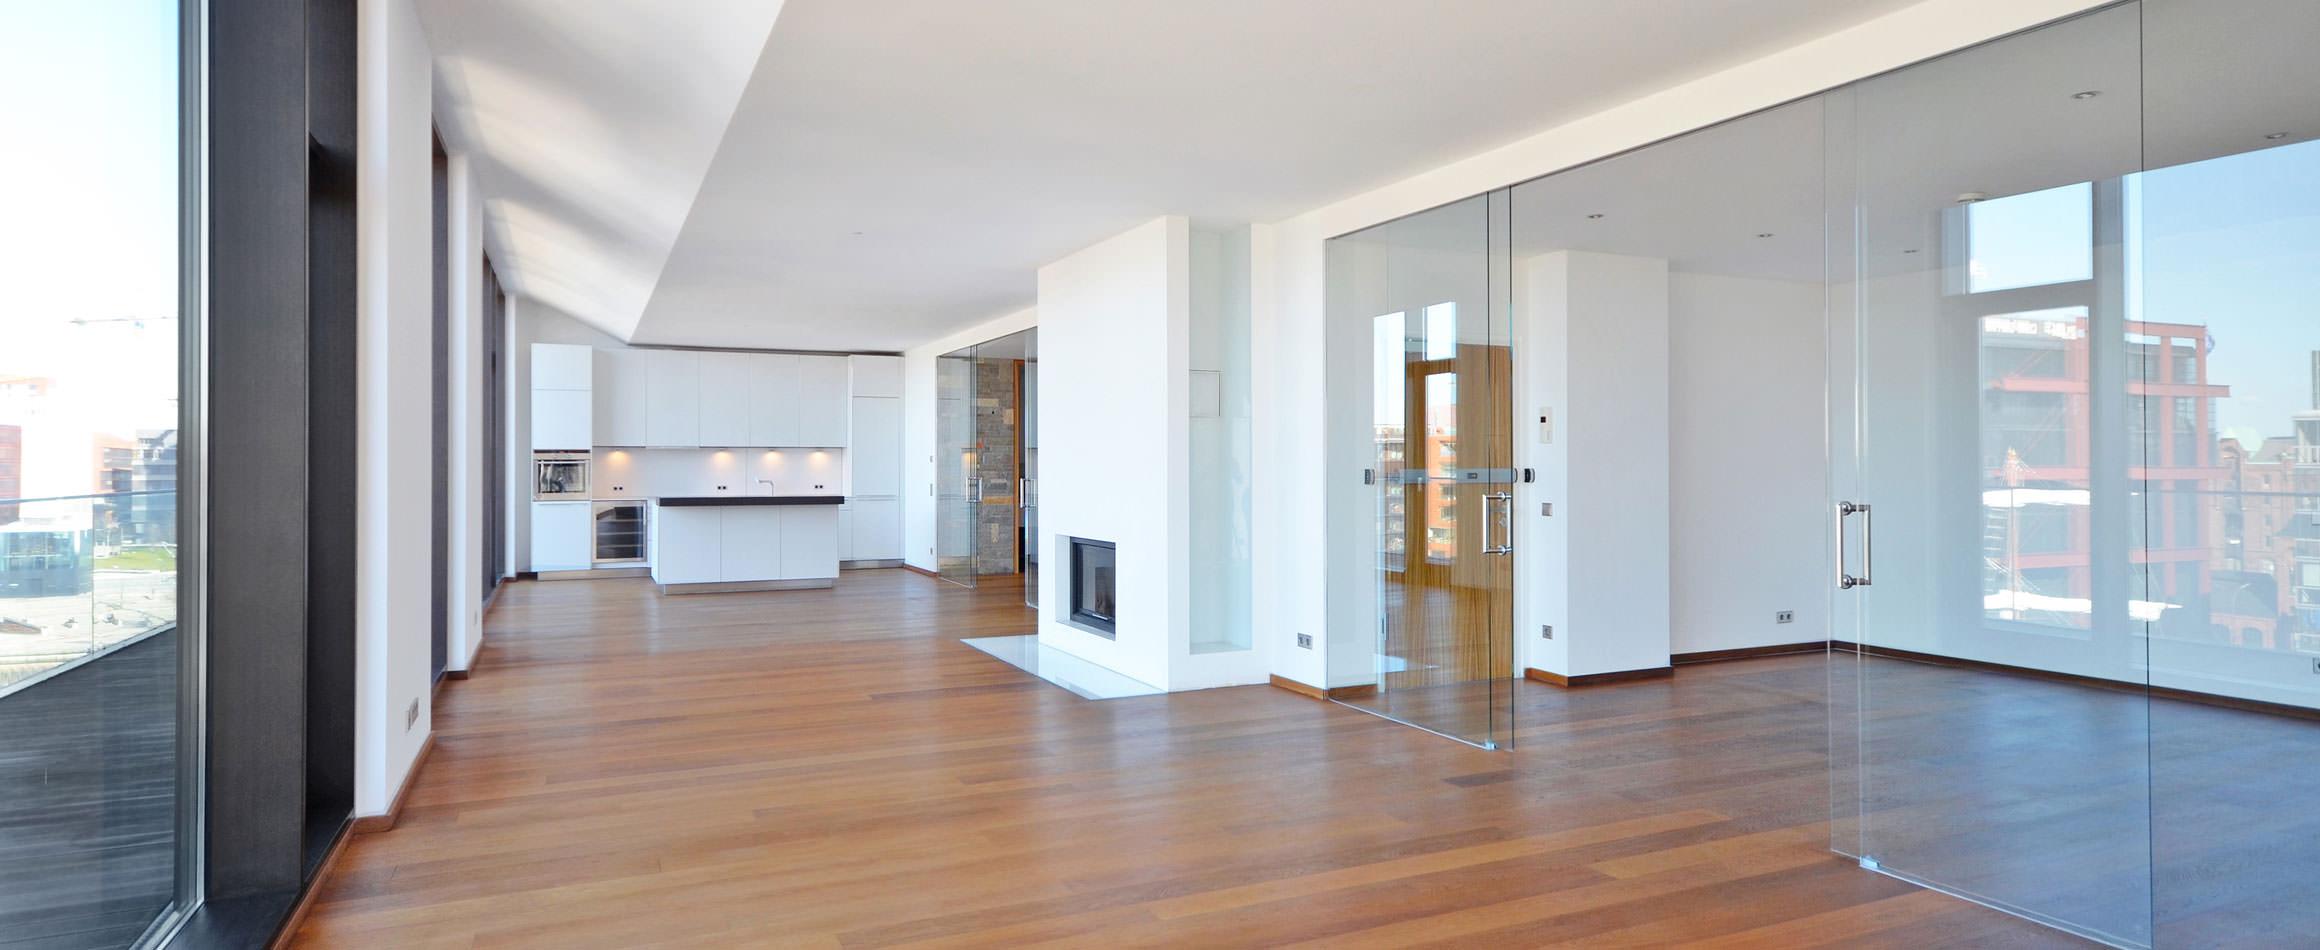 Geraumige penthouse wohnung traumblick stadt  Nett Geraumige Penthouse Wohnung Traumblick Stadt Galerie - Die ...